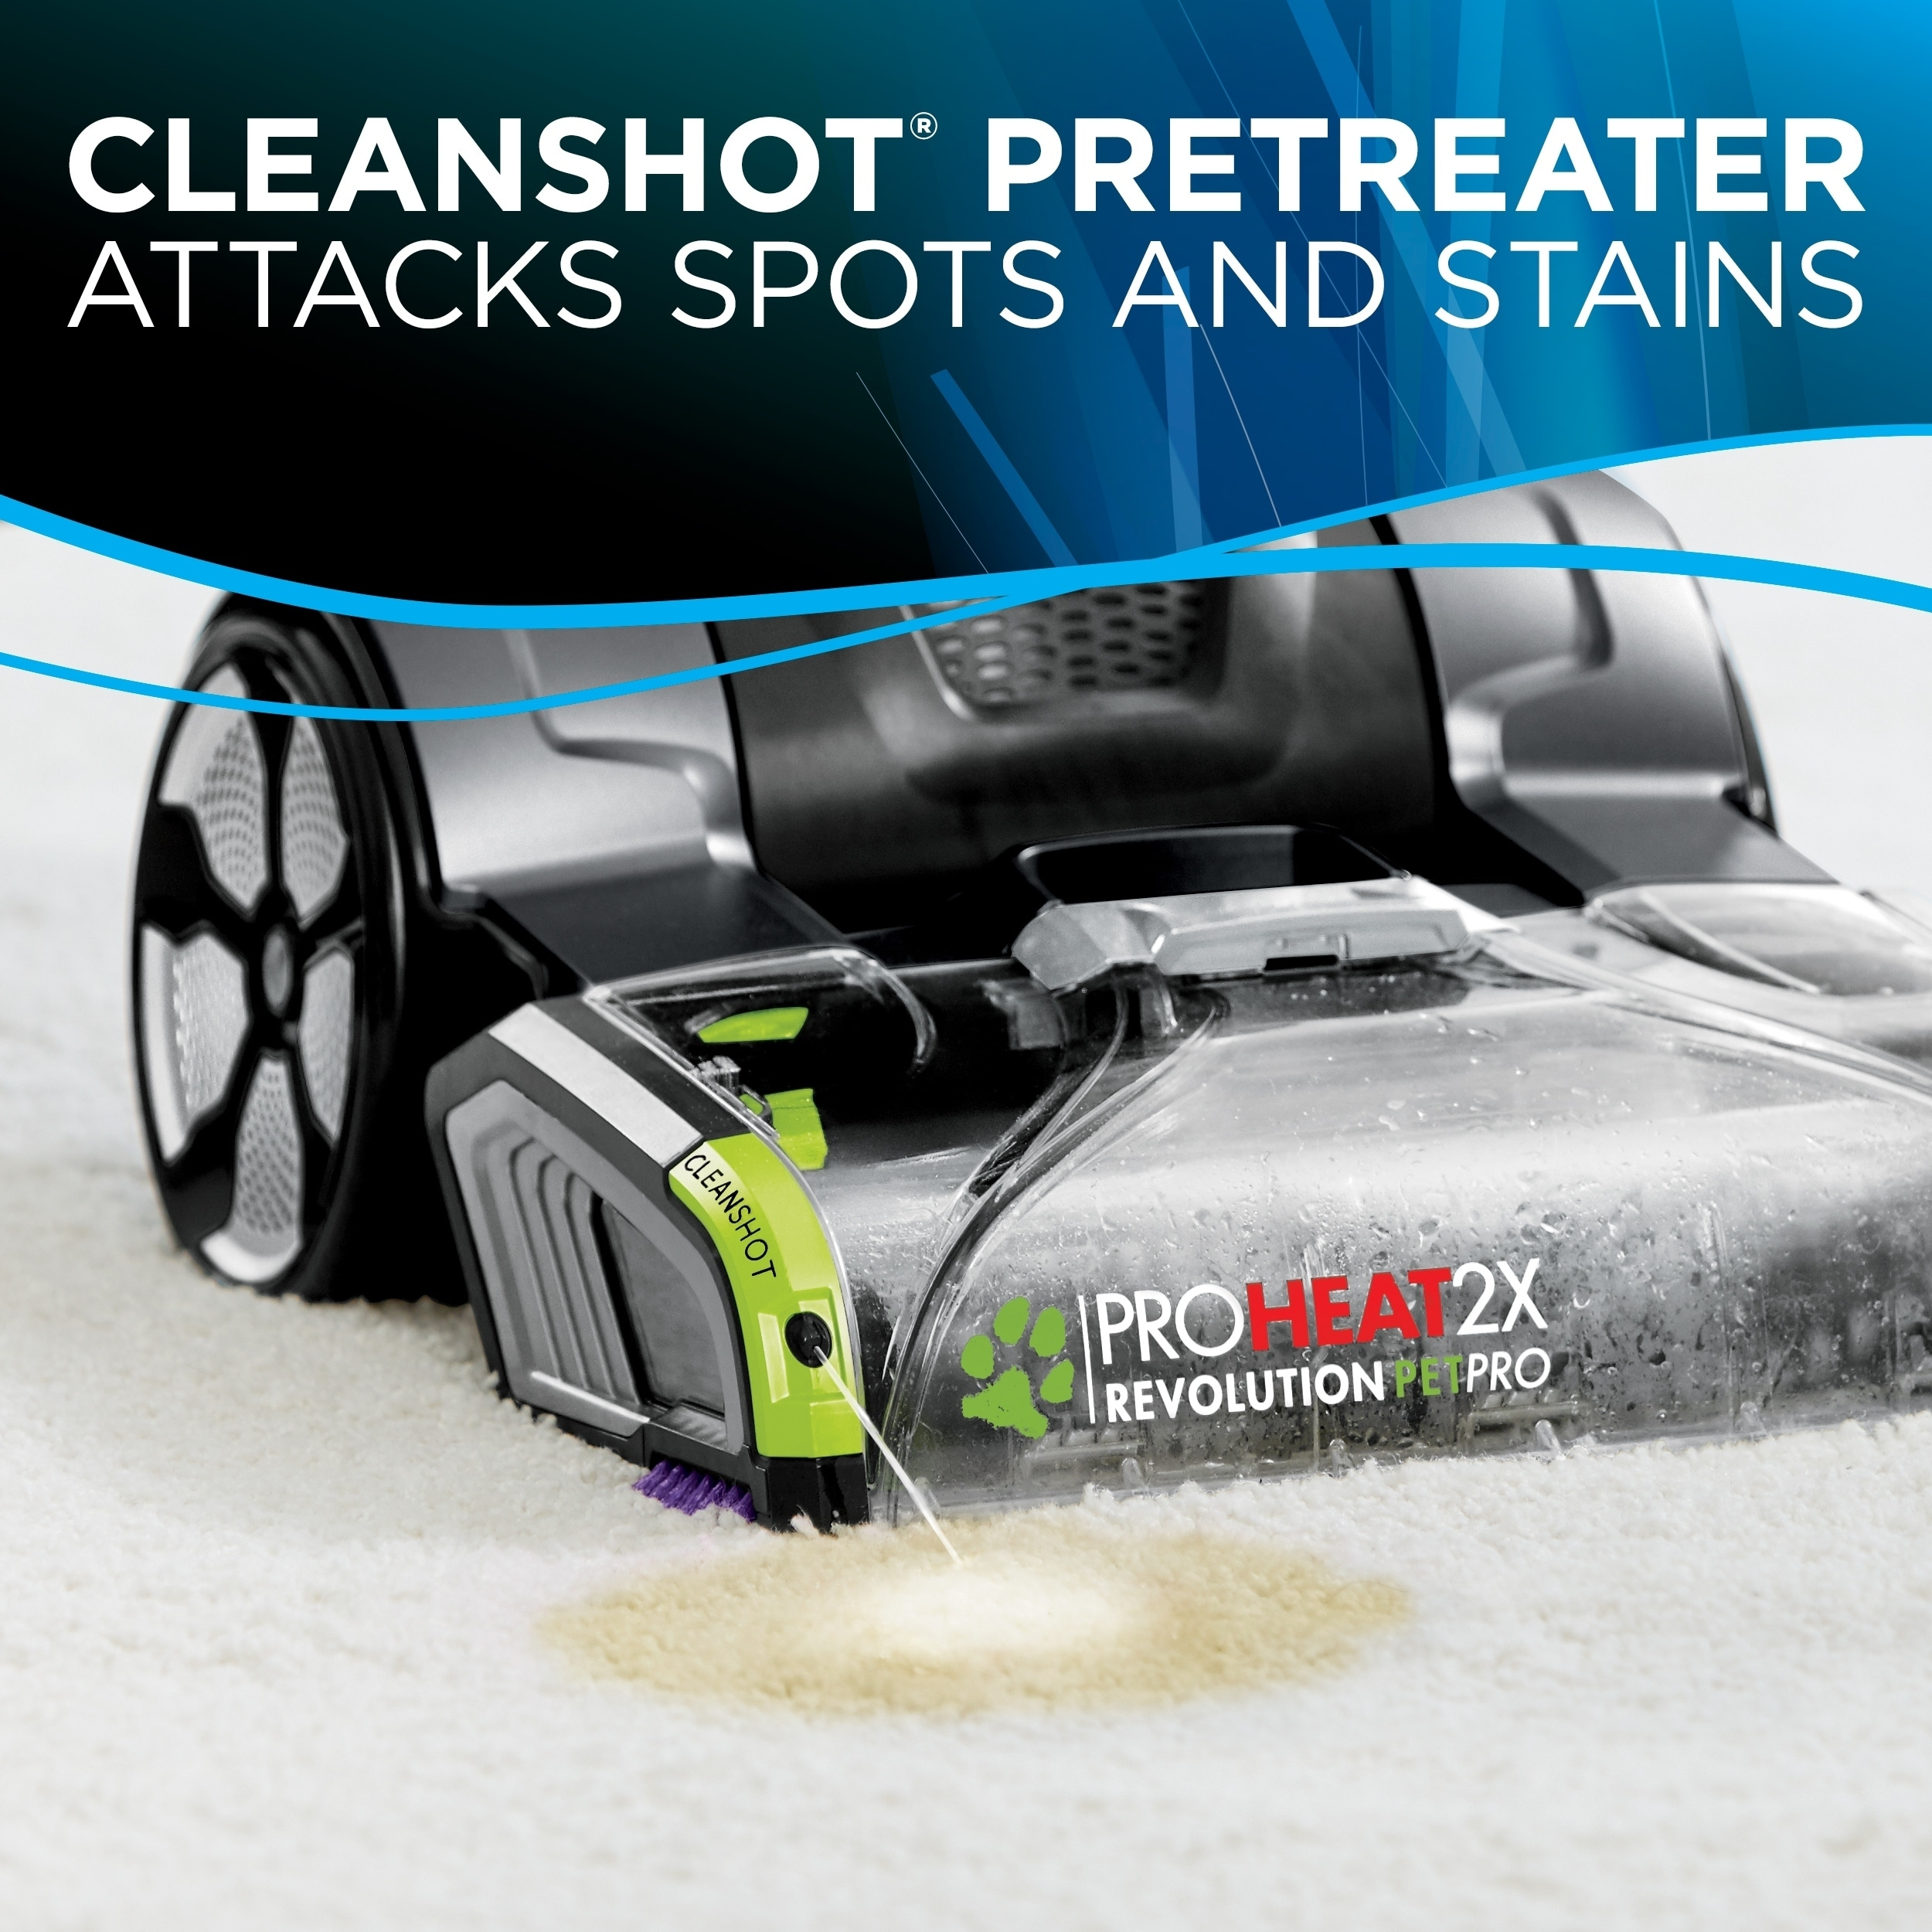 Shop Bissell Proheat 2x Revolution Pet Pro Carpet Cleaner Free